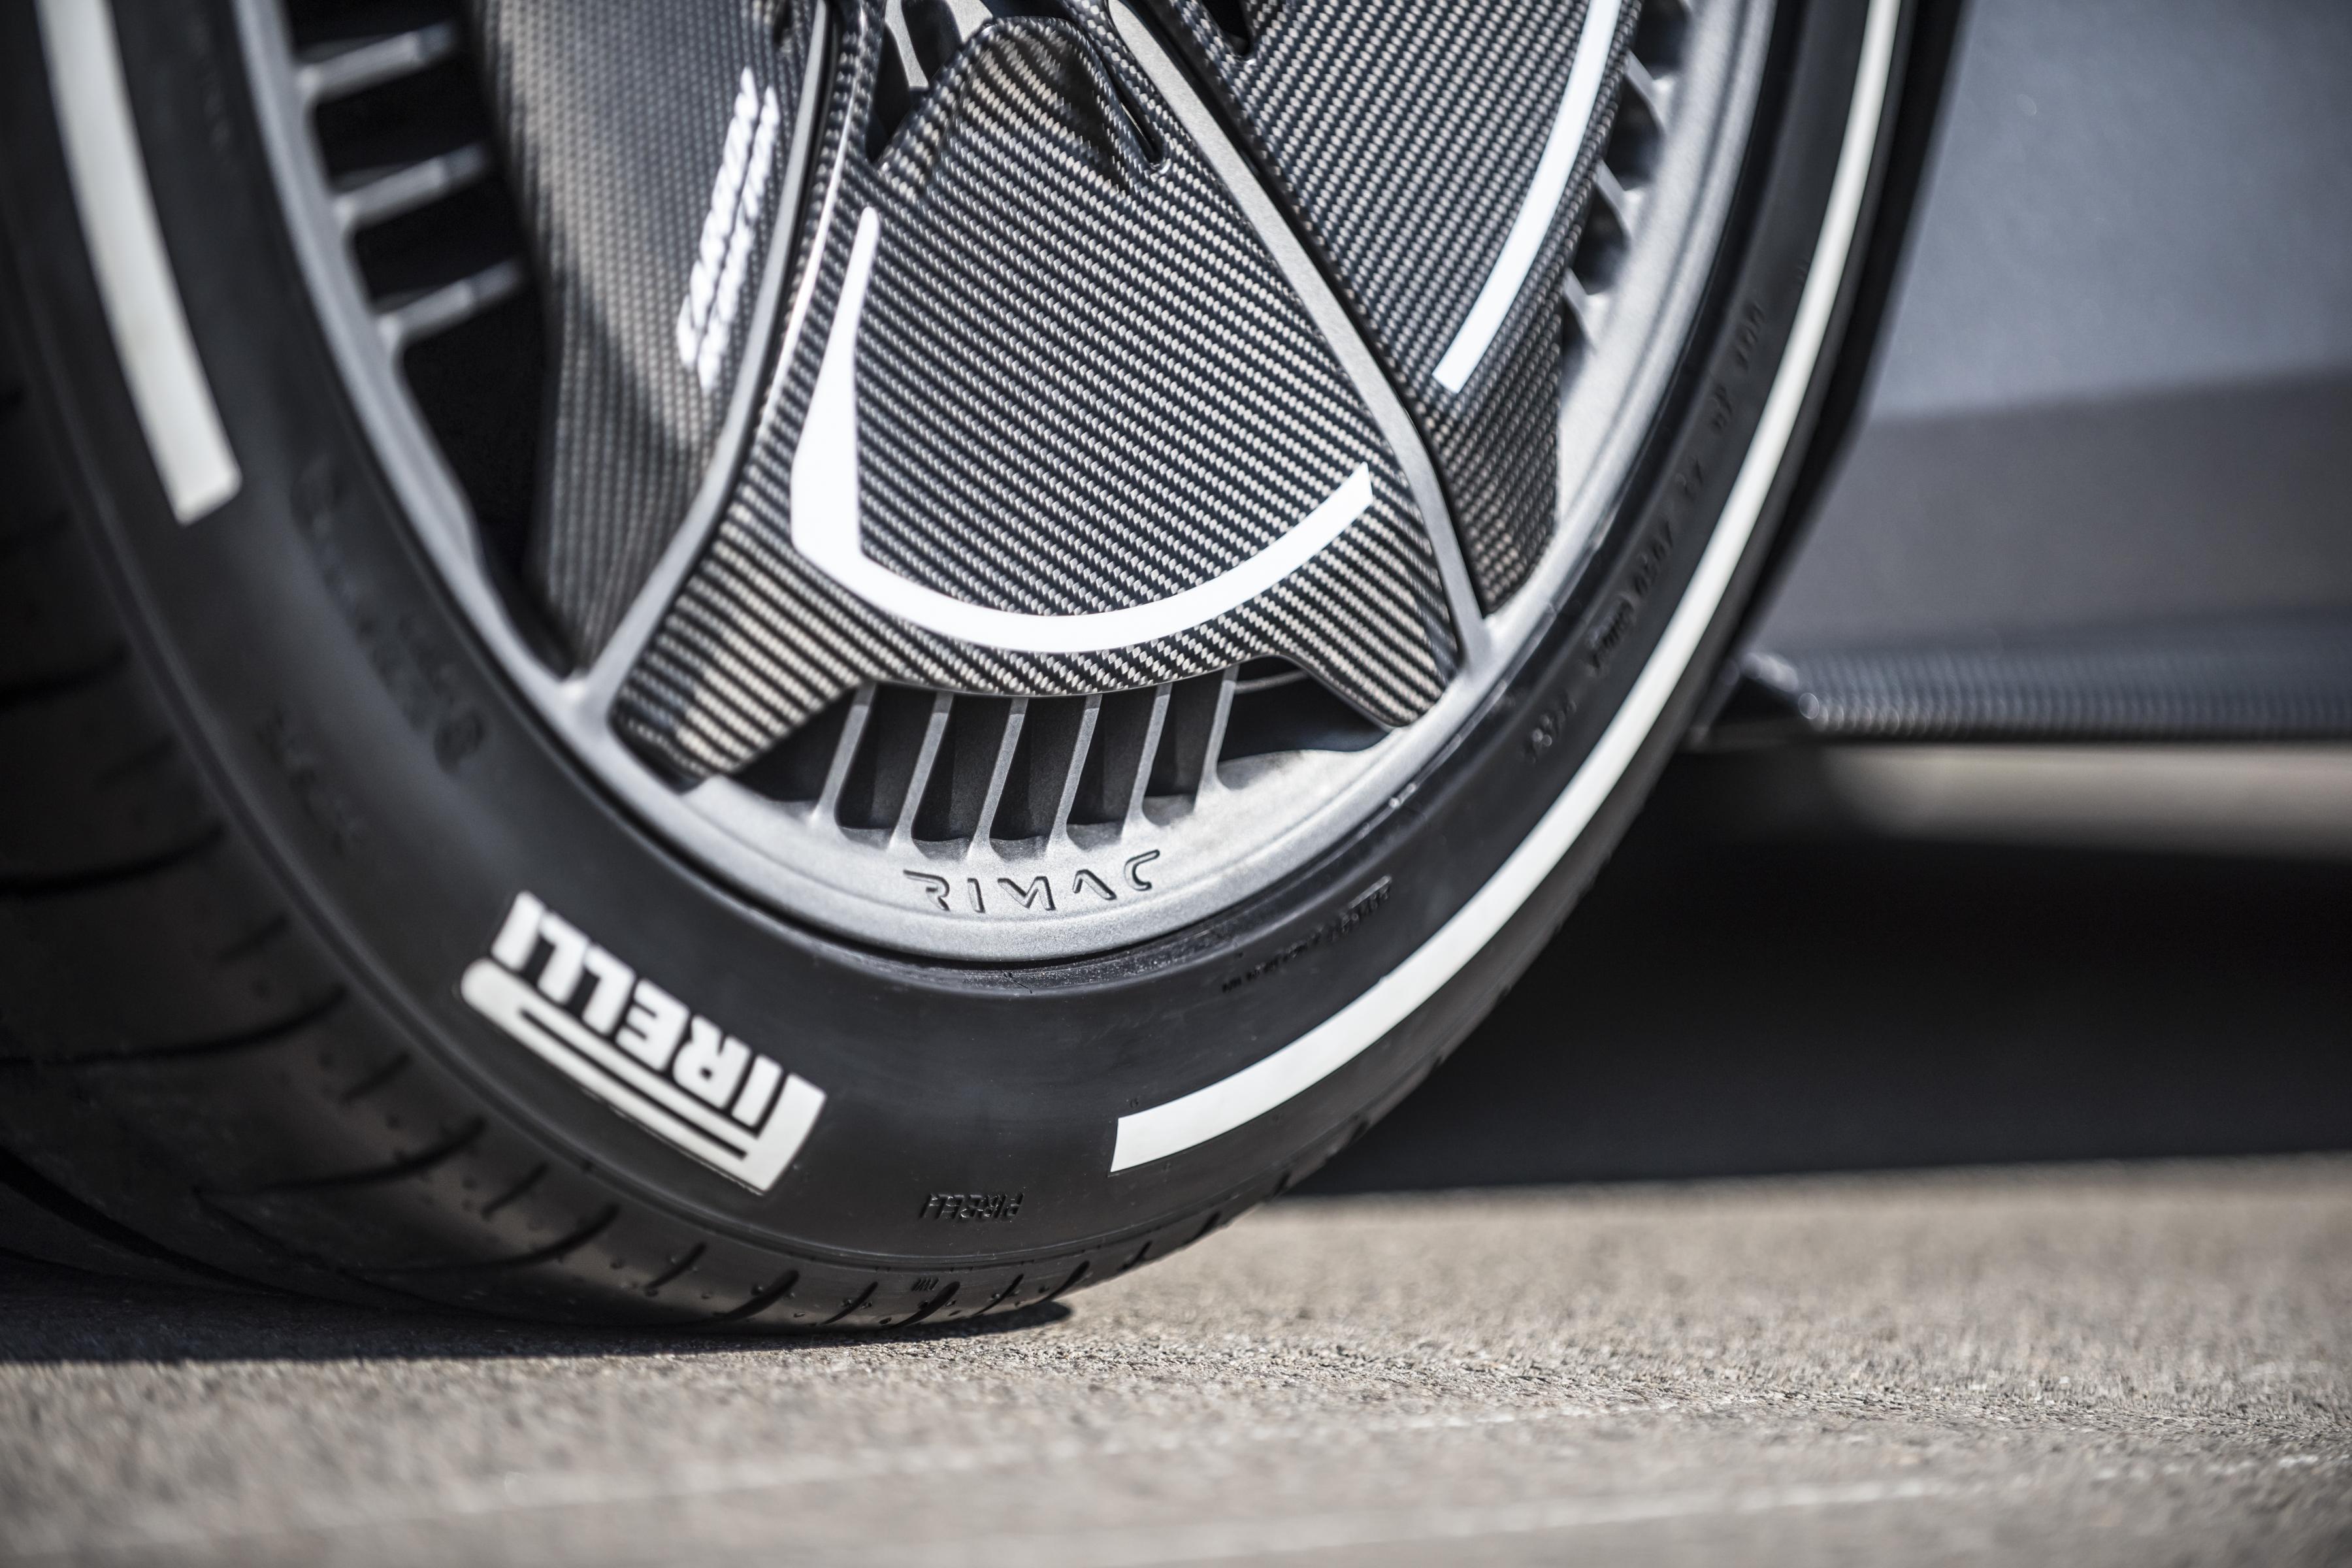 rimac-c_two_detail_carbon-aero-wheel